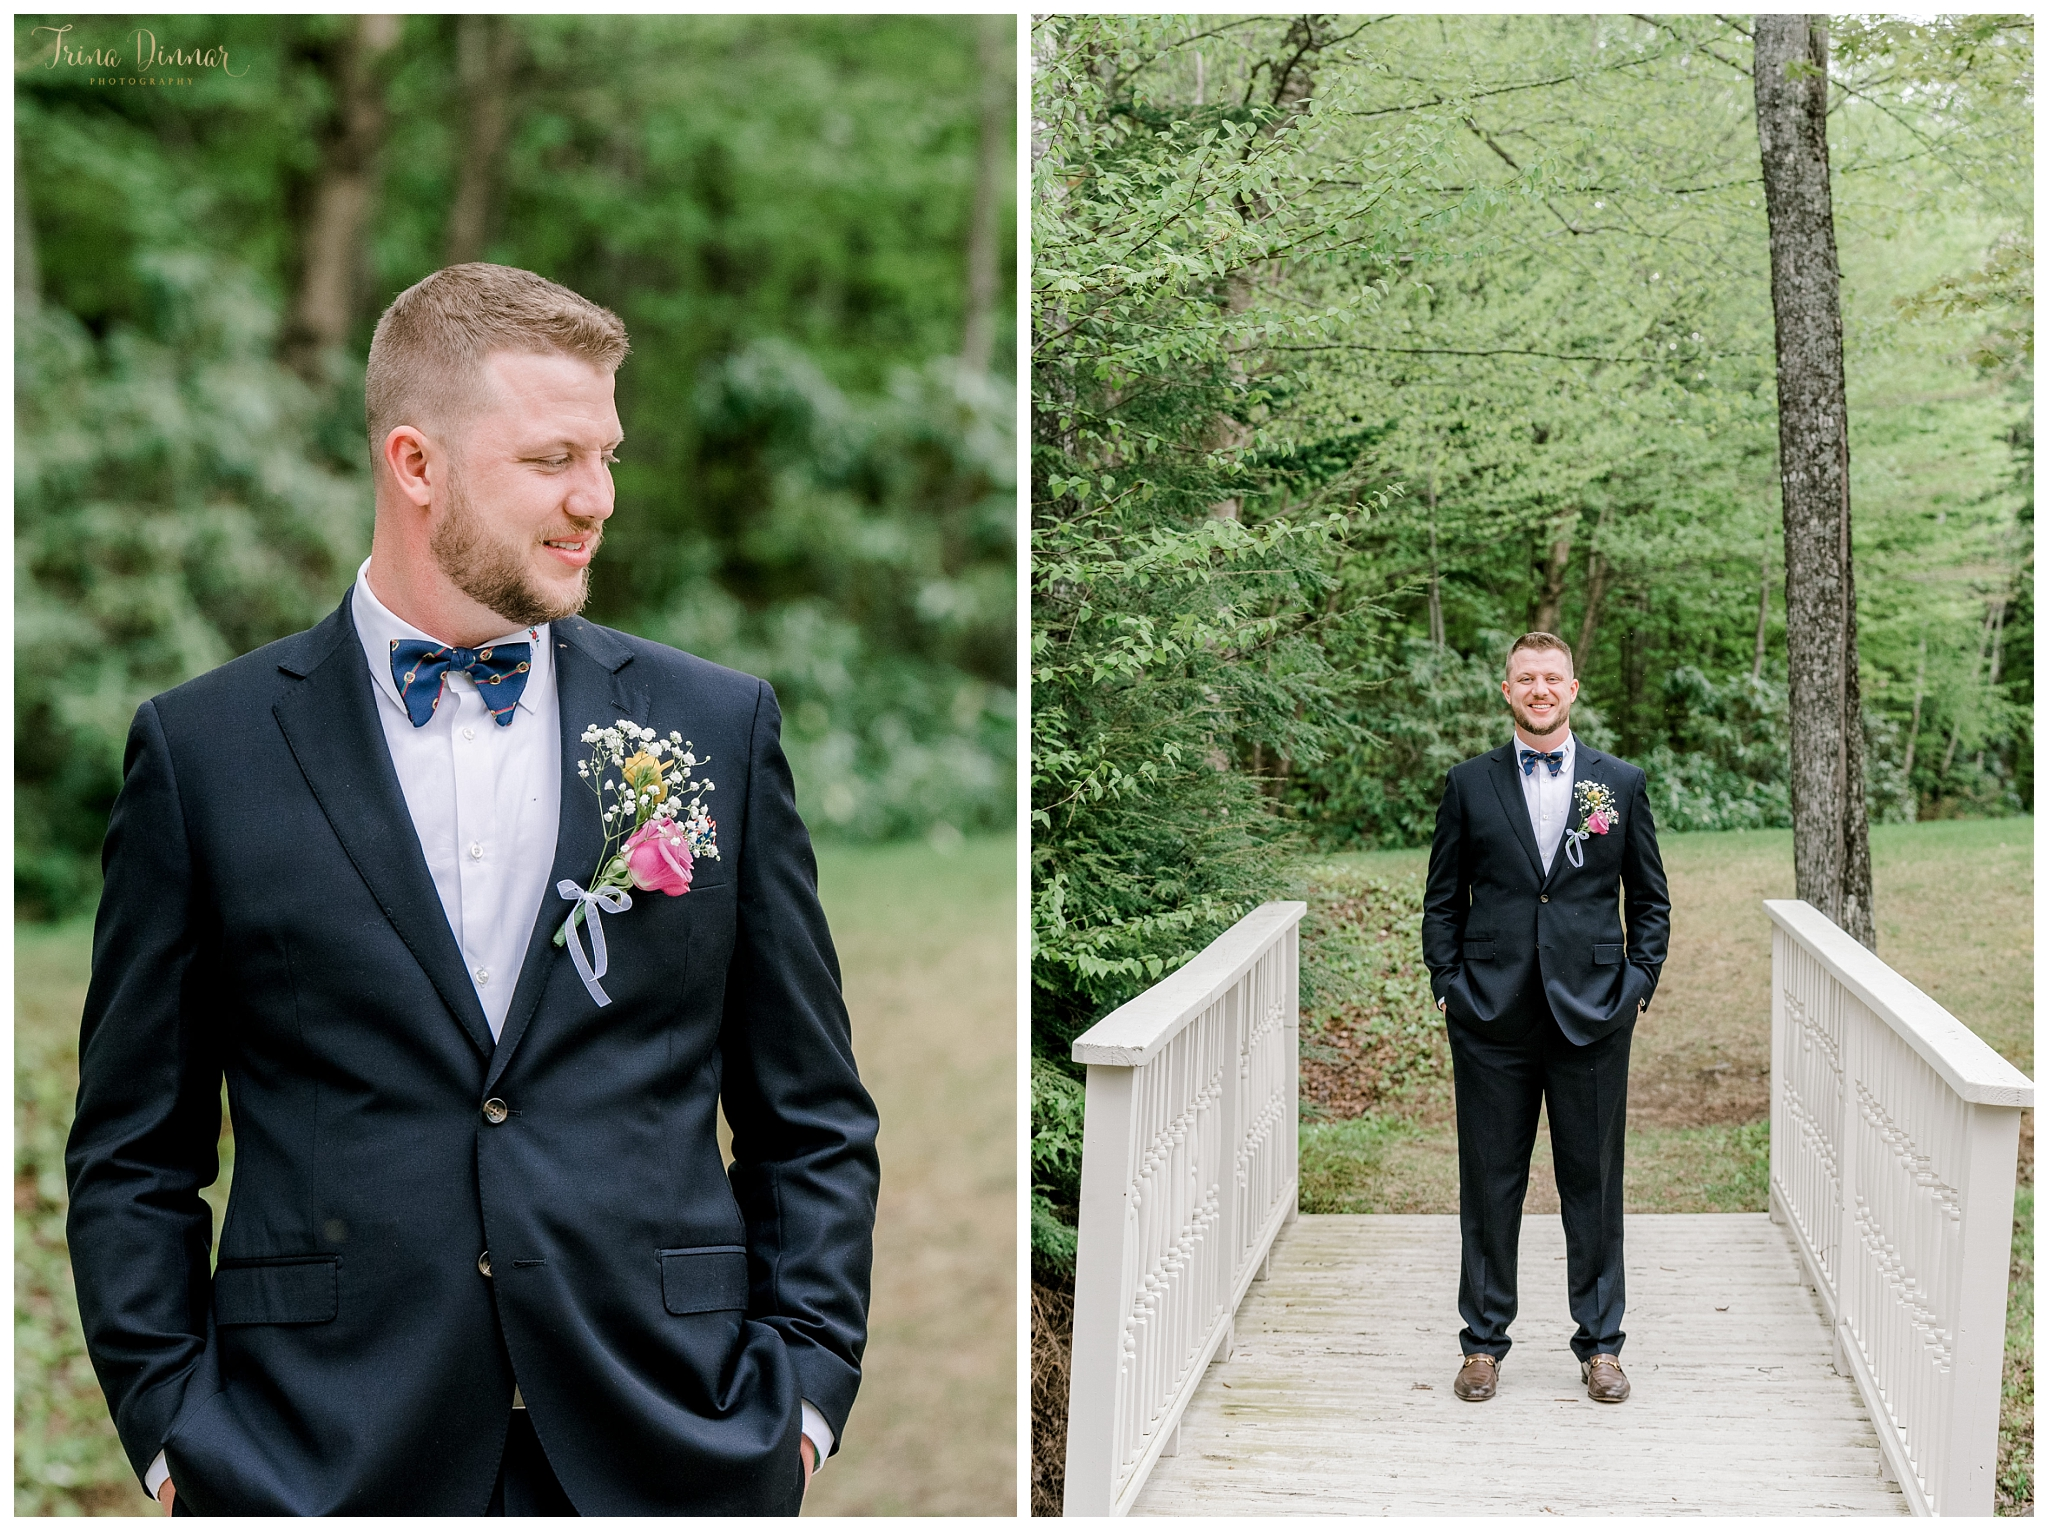 Groom Wedding Portraits at Sunday River